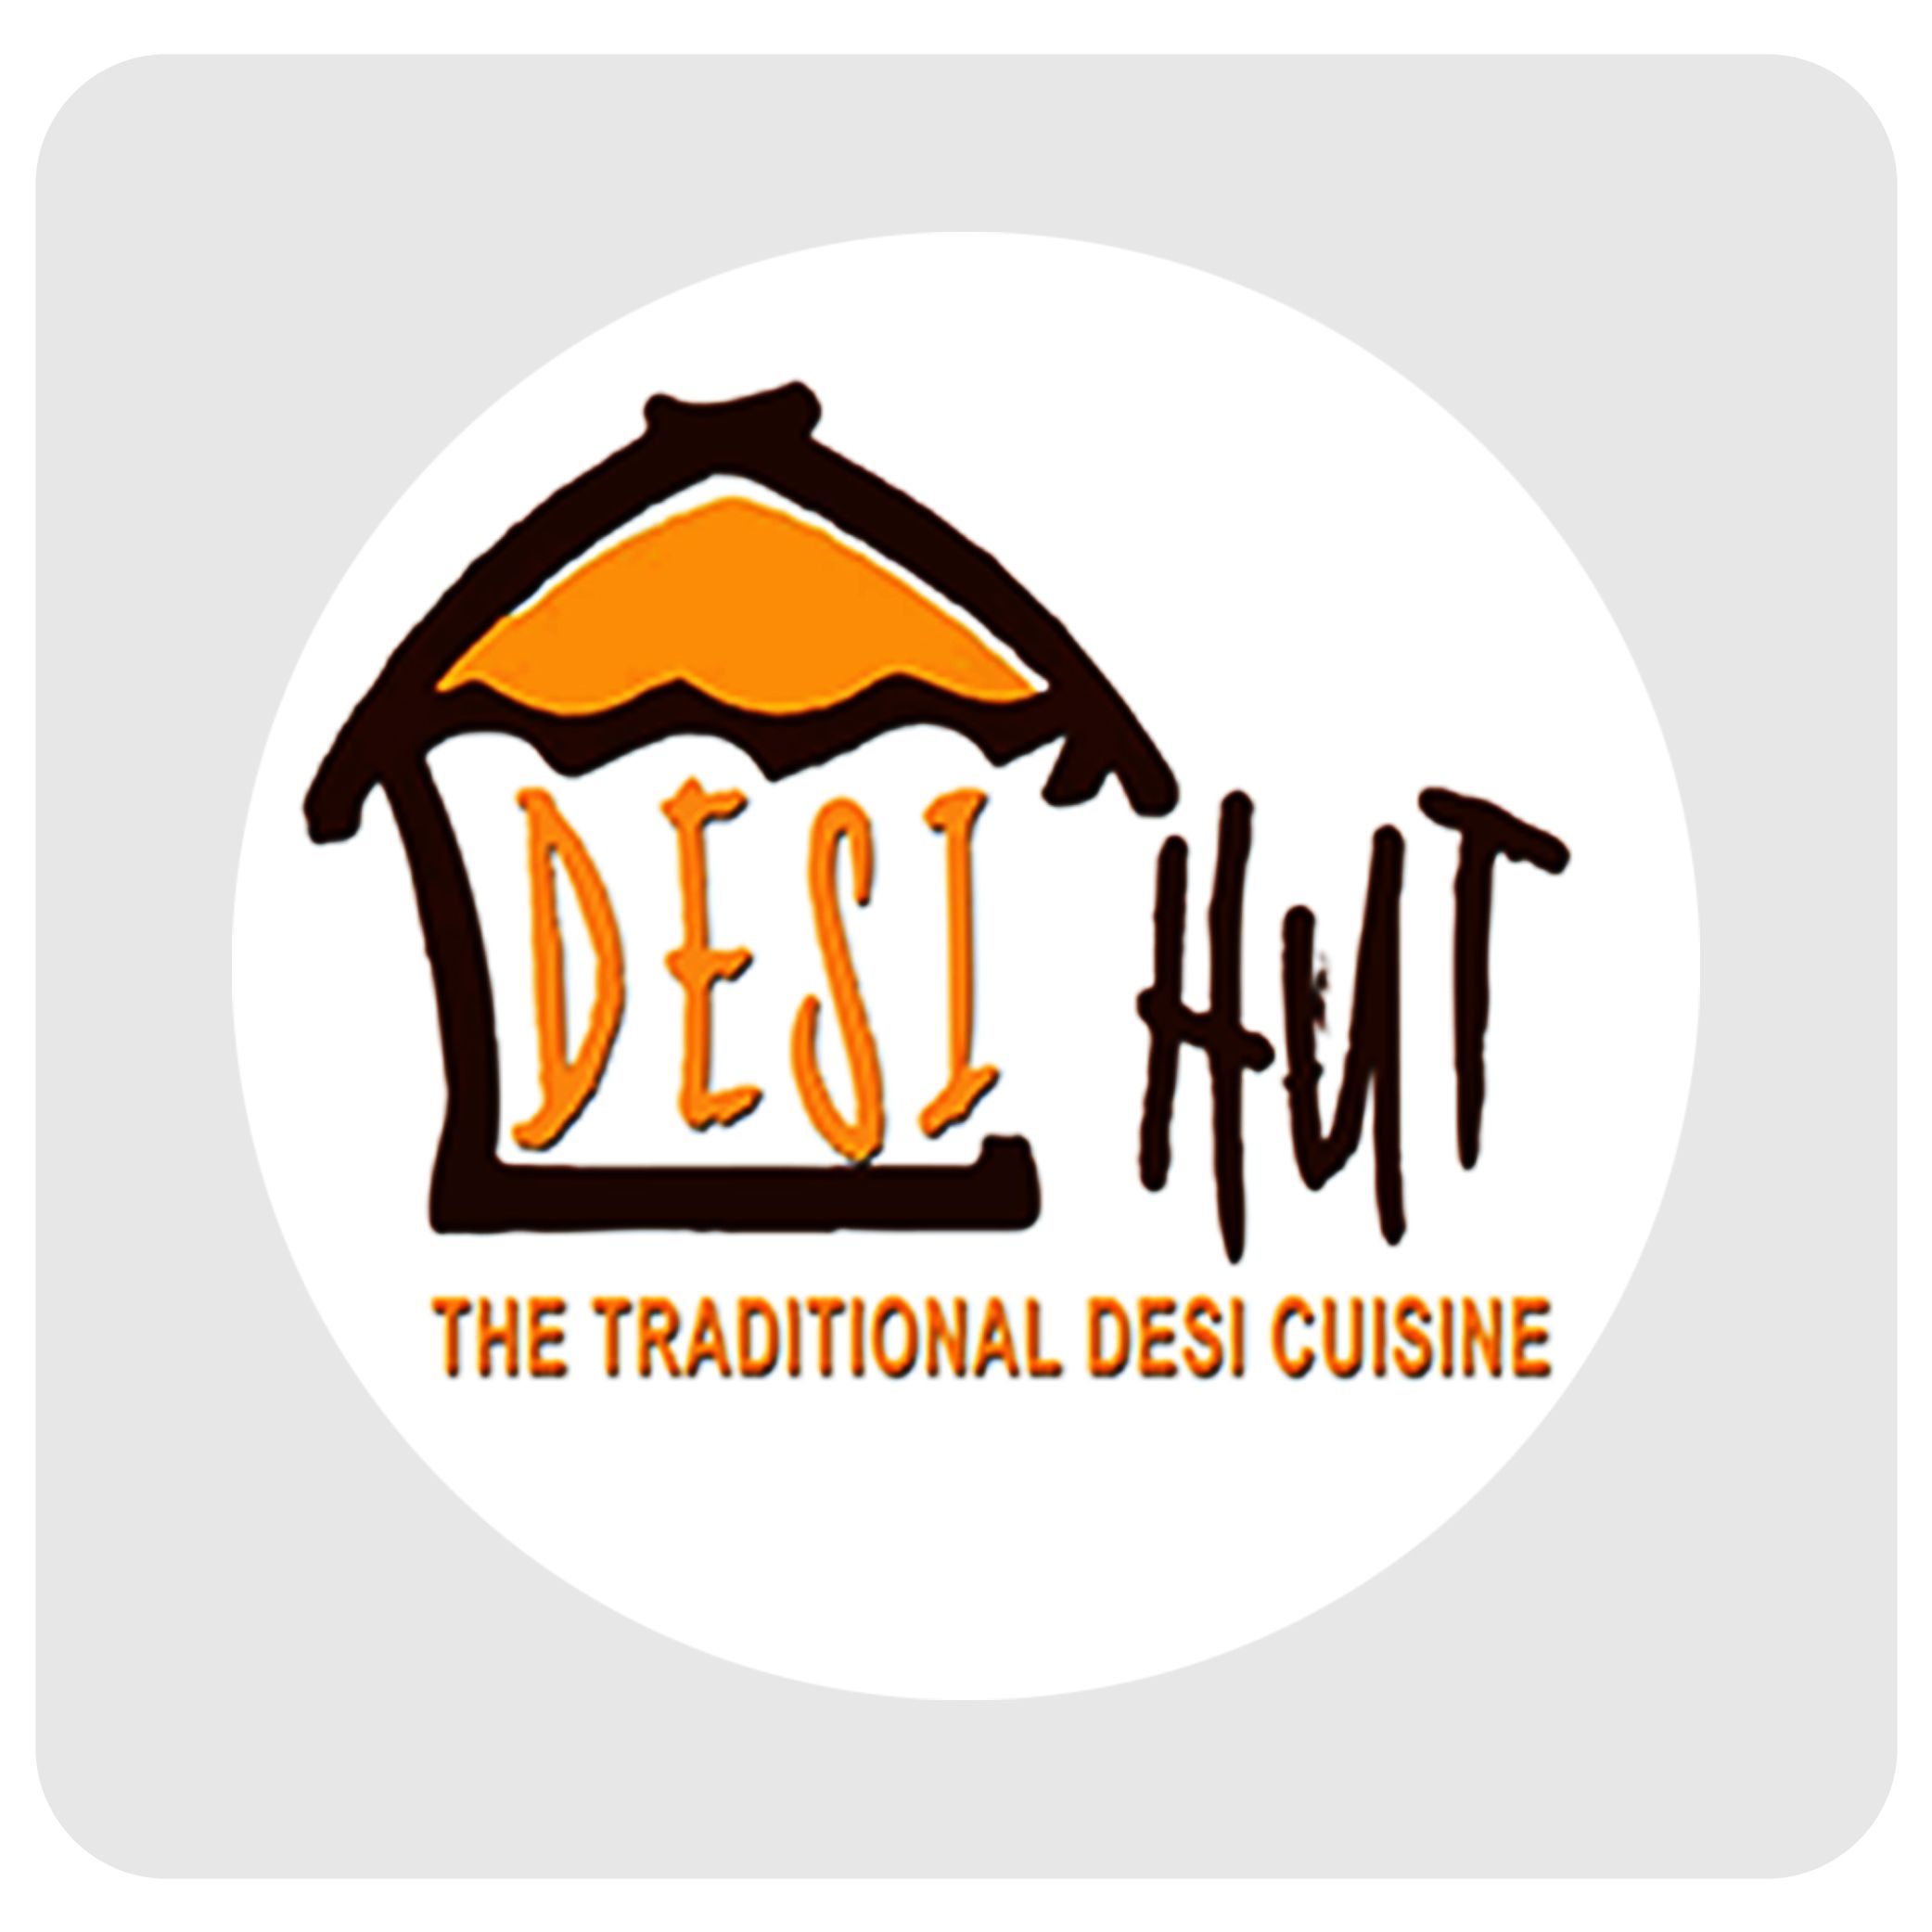 Desi Hut